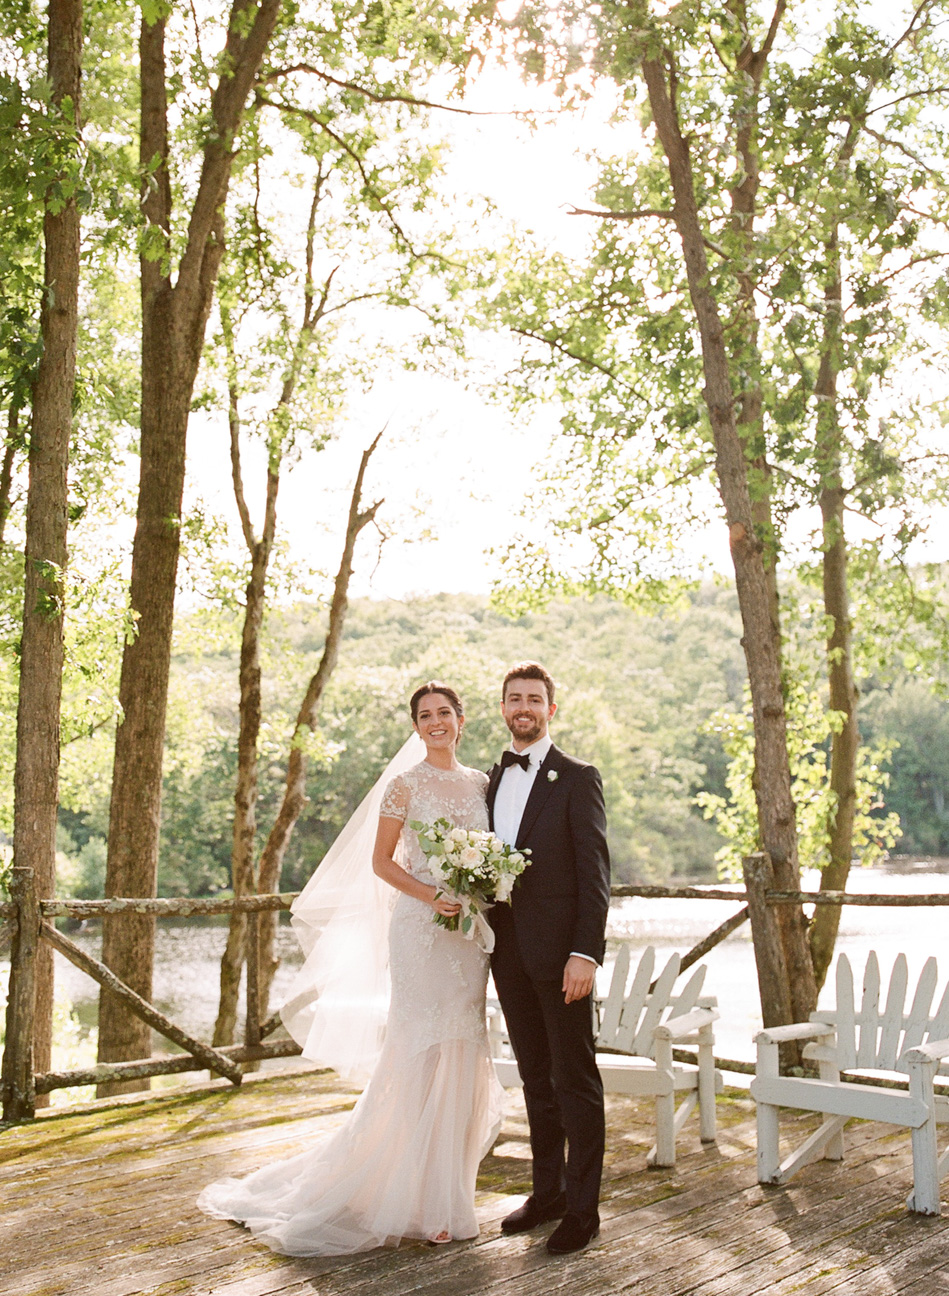 KarenHillPhotography-Parizat-Wedding-0232.jpg